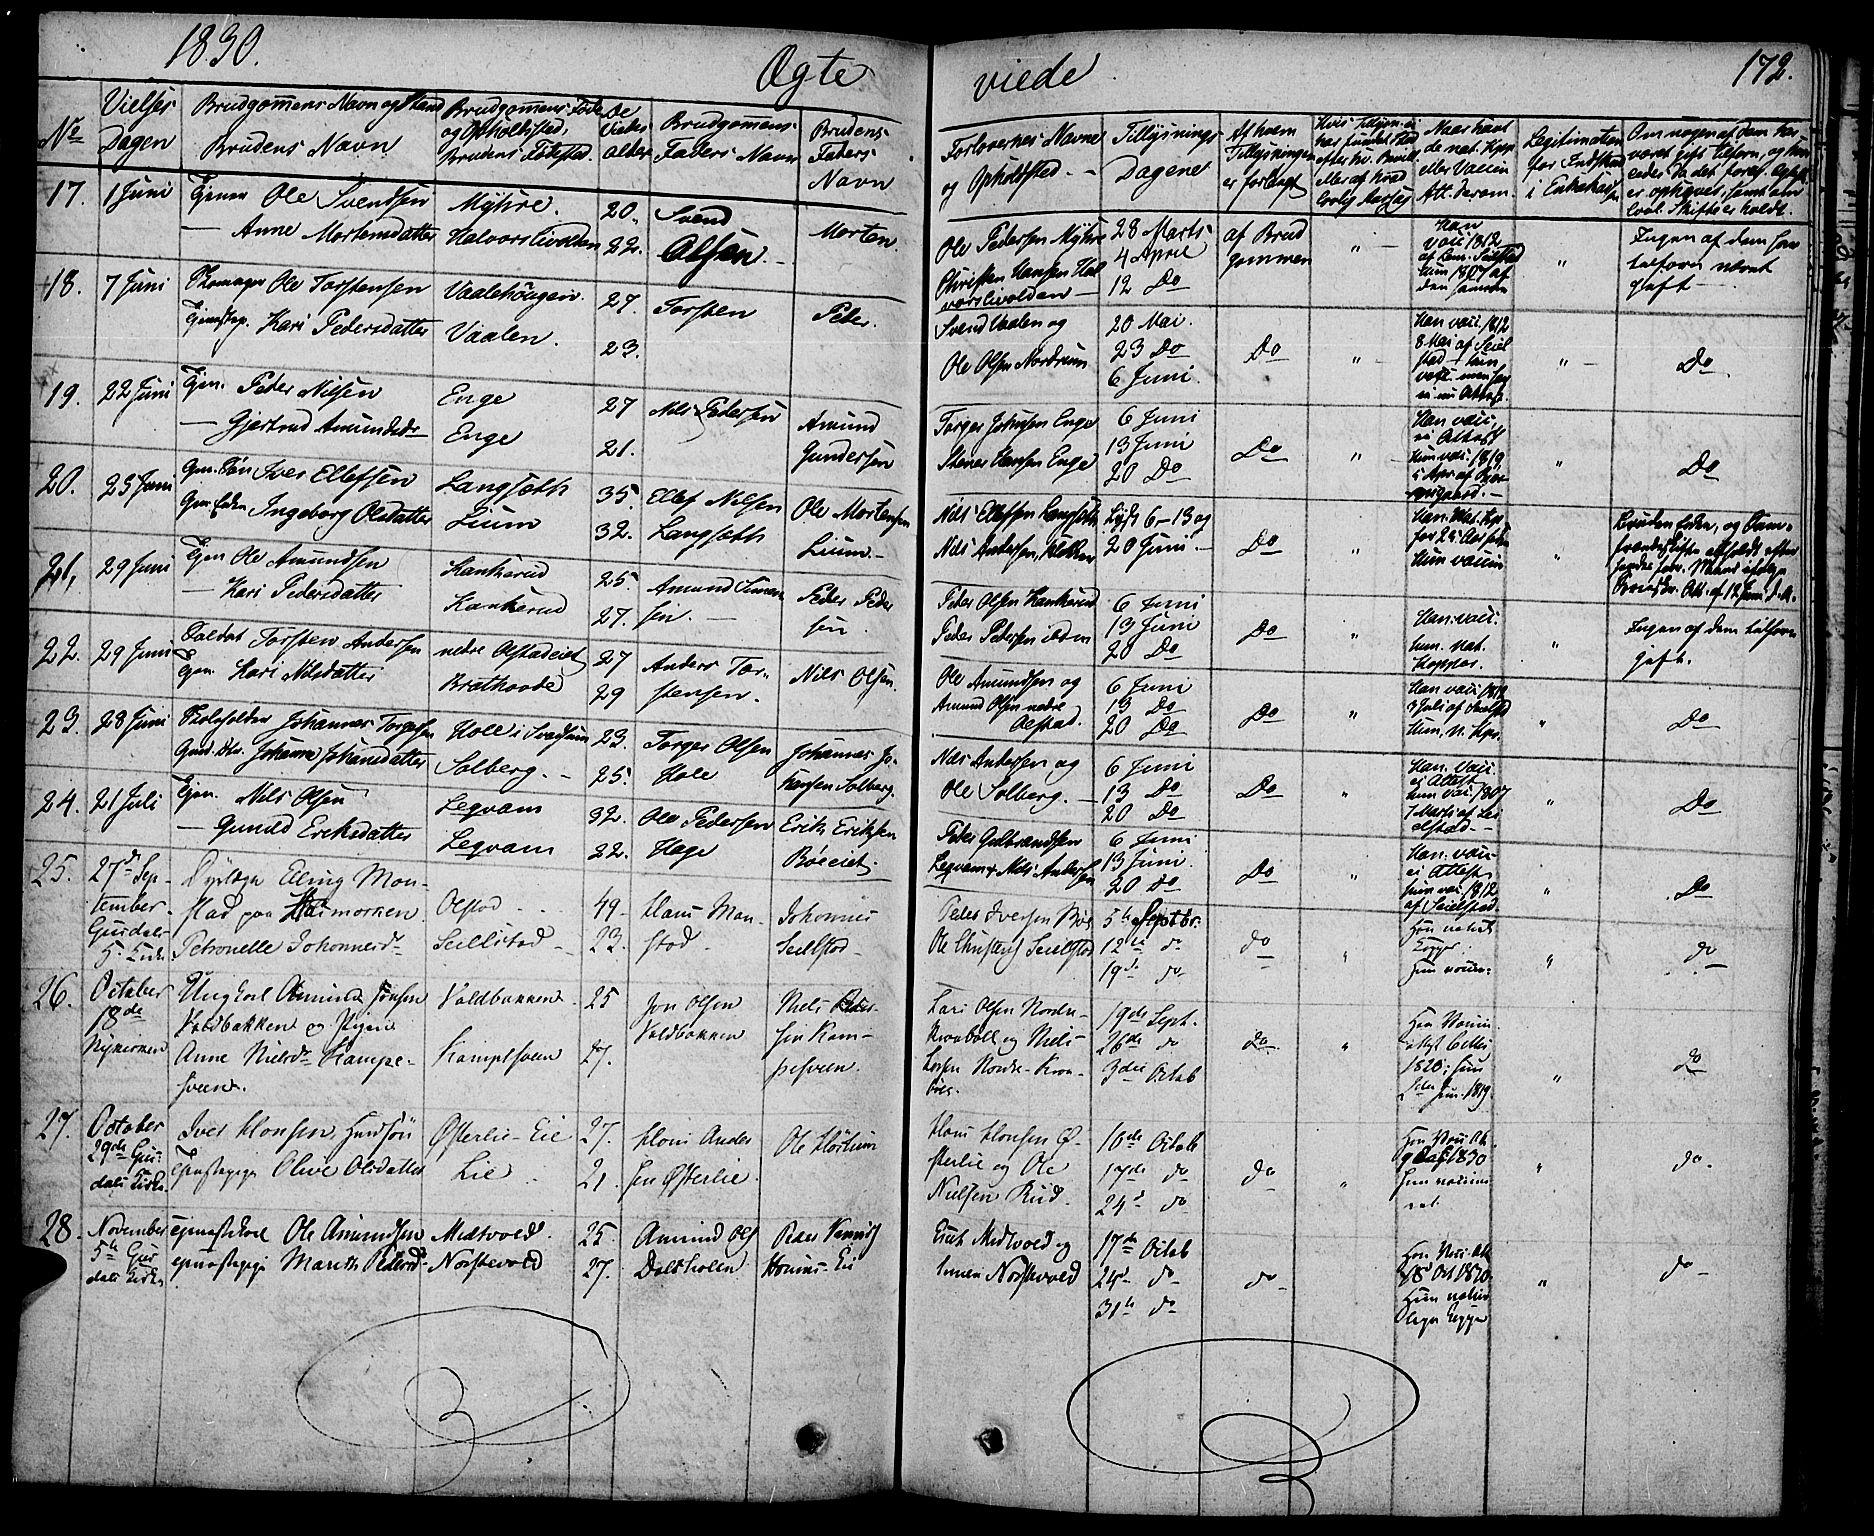 SAH, Gausdal prestekontor, Ministerialbok nr. 6, 1830-1839, s. 172